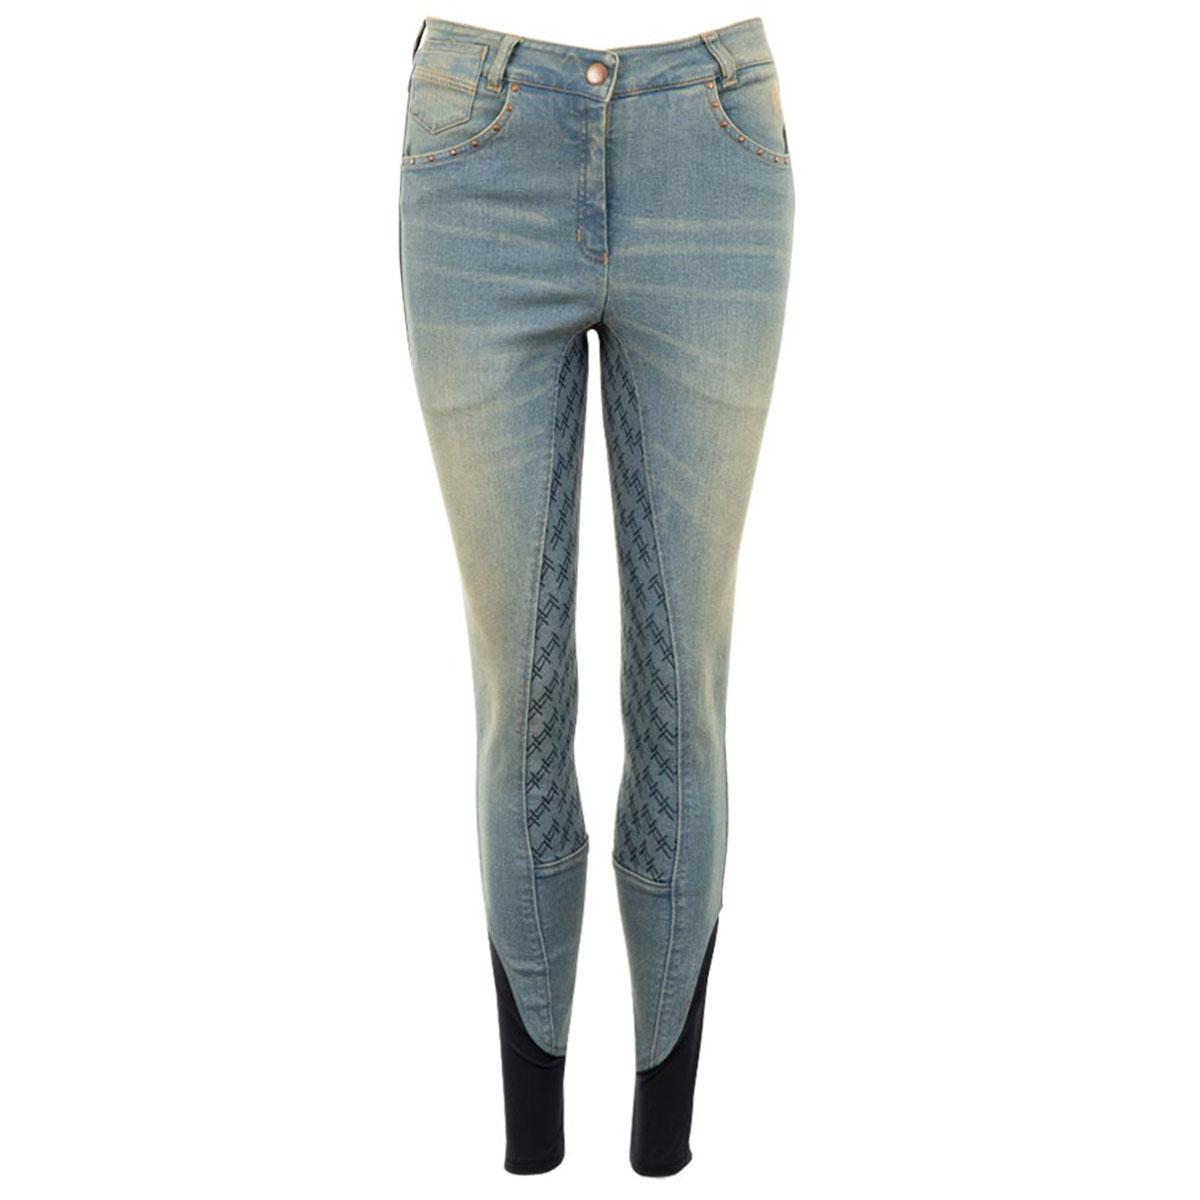 Anky Light Denim FG jeans rijbroek jeans maat:44